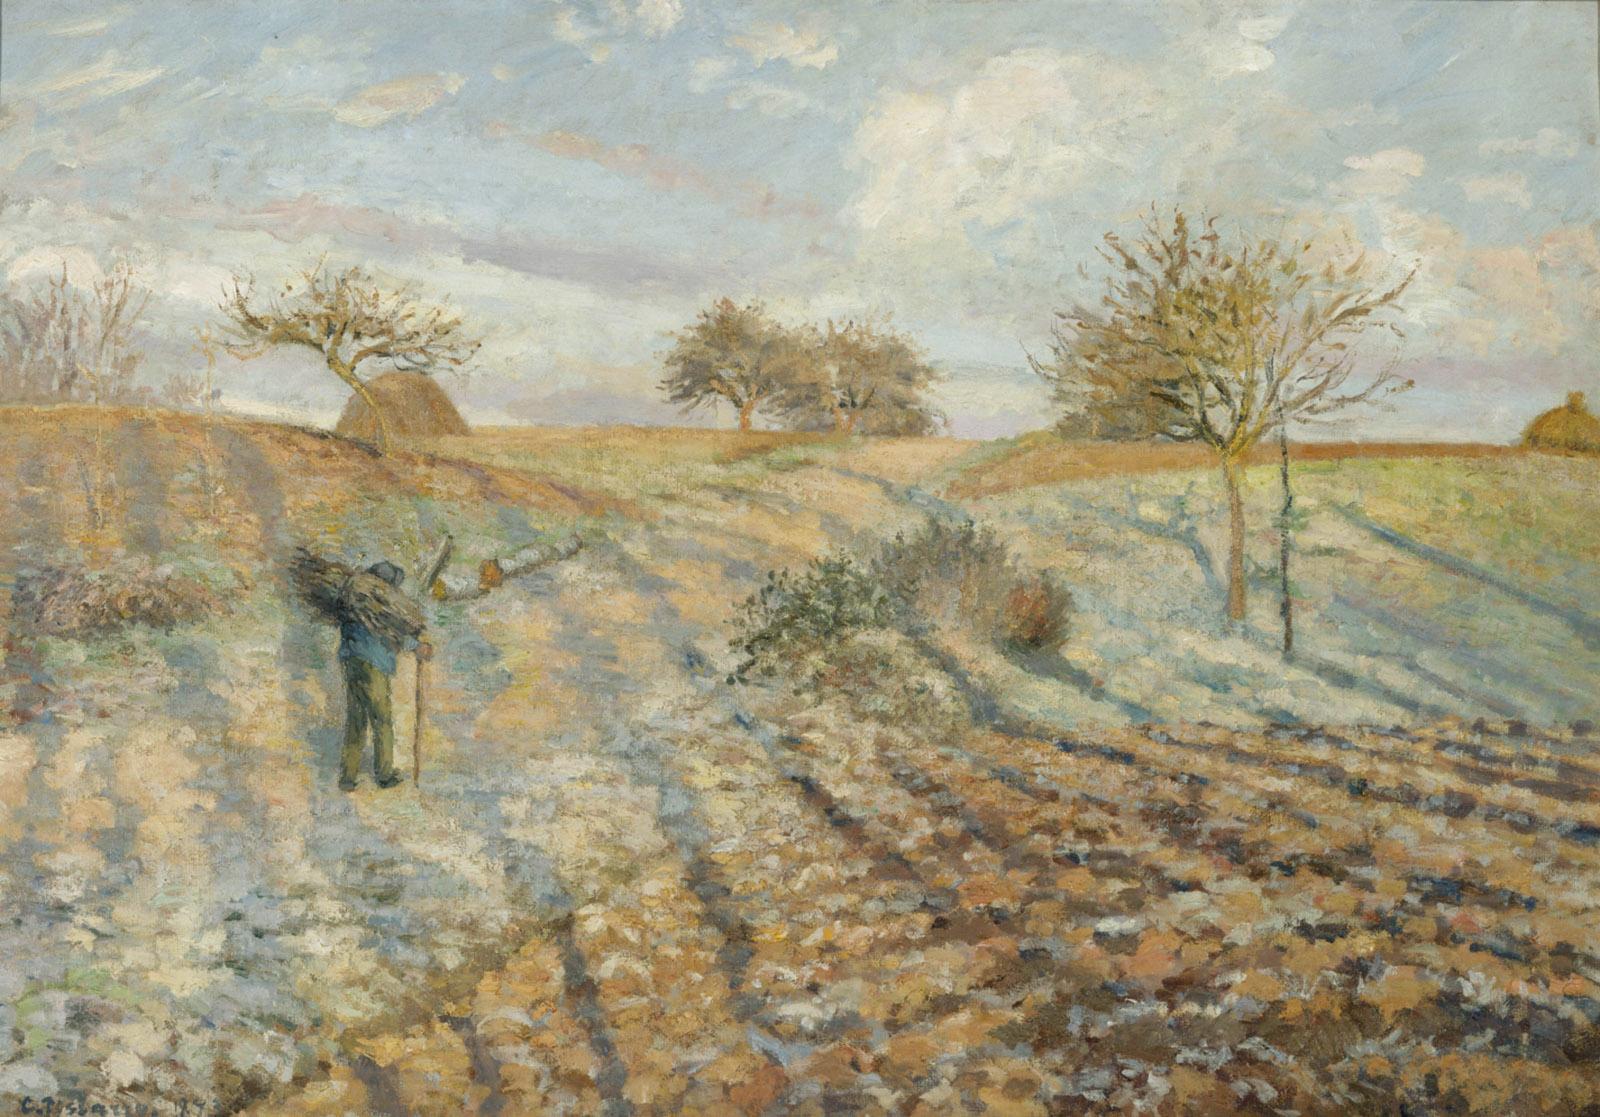 Camille Pissarro: Hoar Frost (Gelée blanche à Ennery), 1873